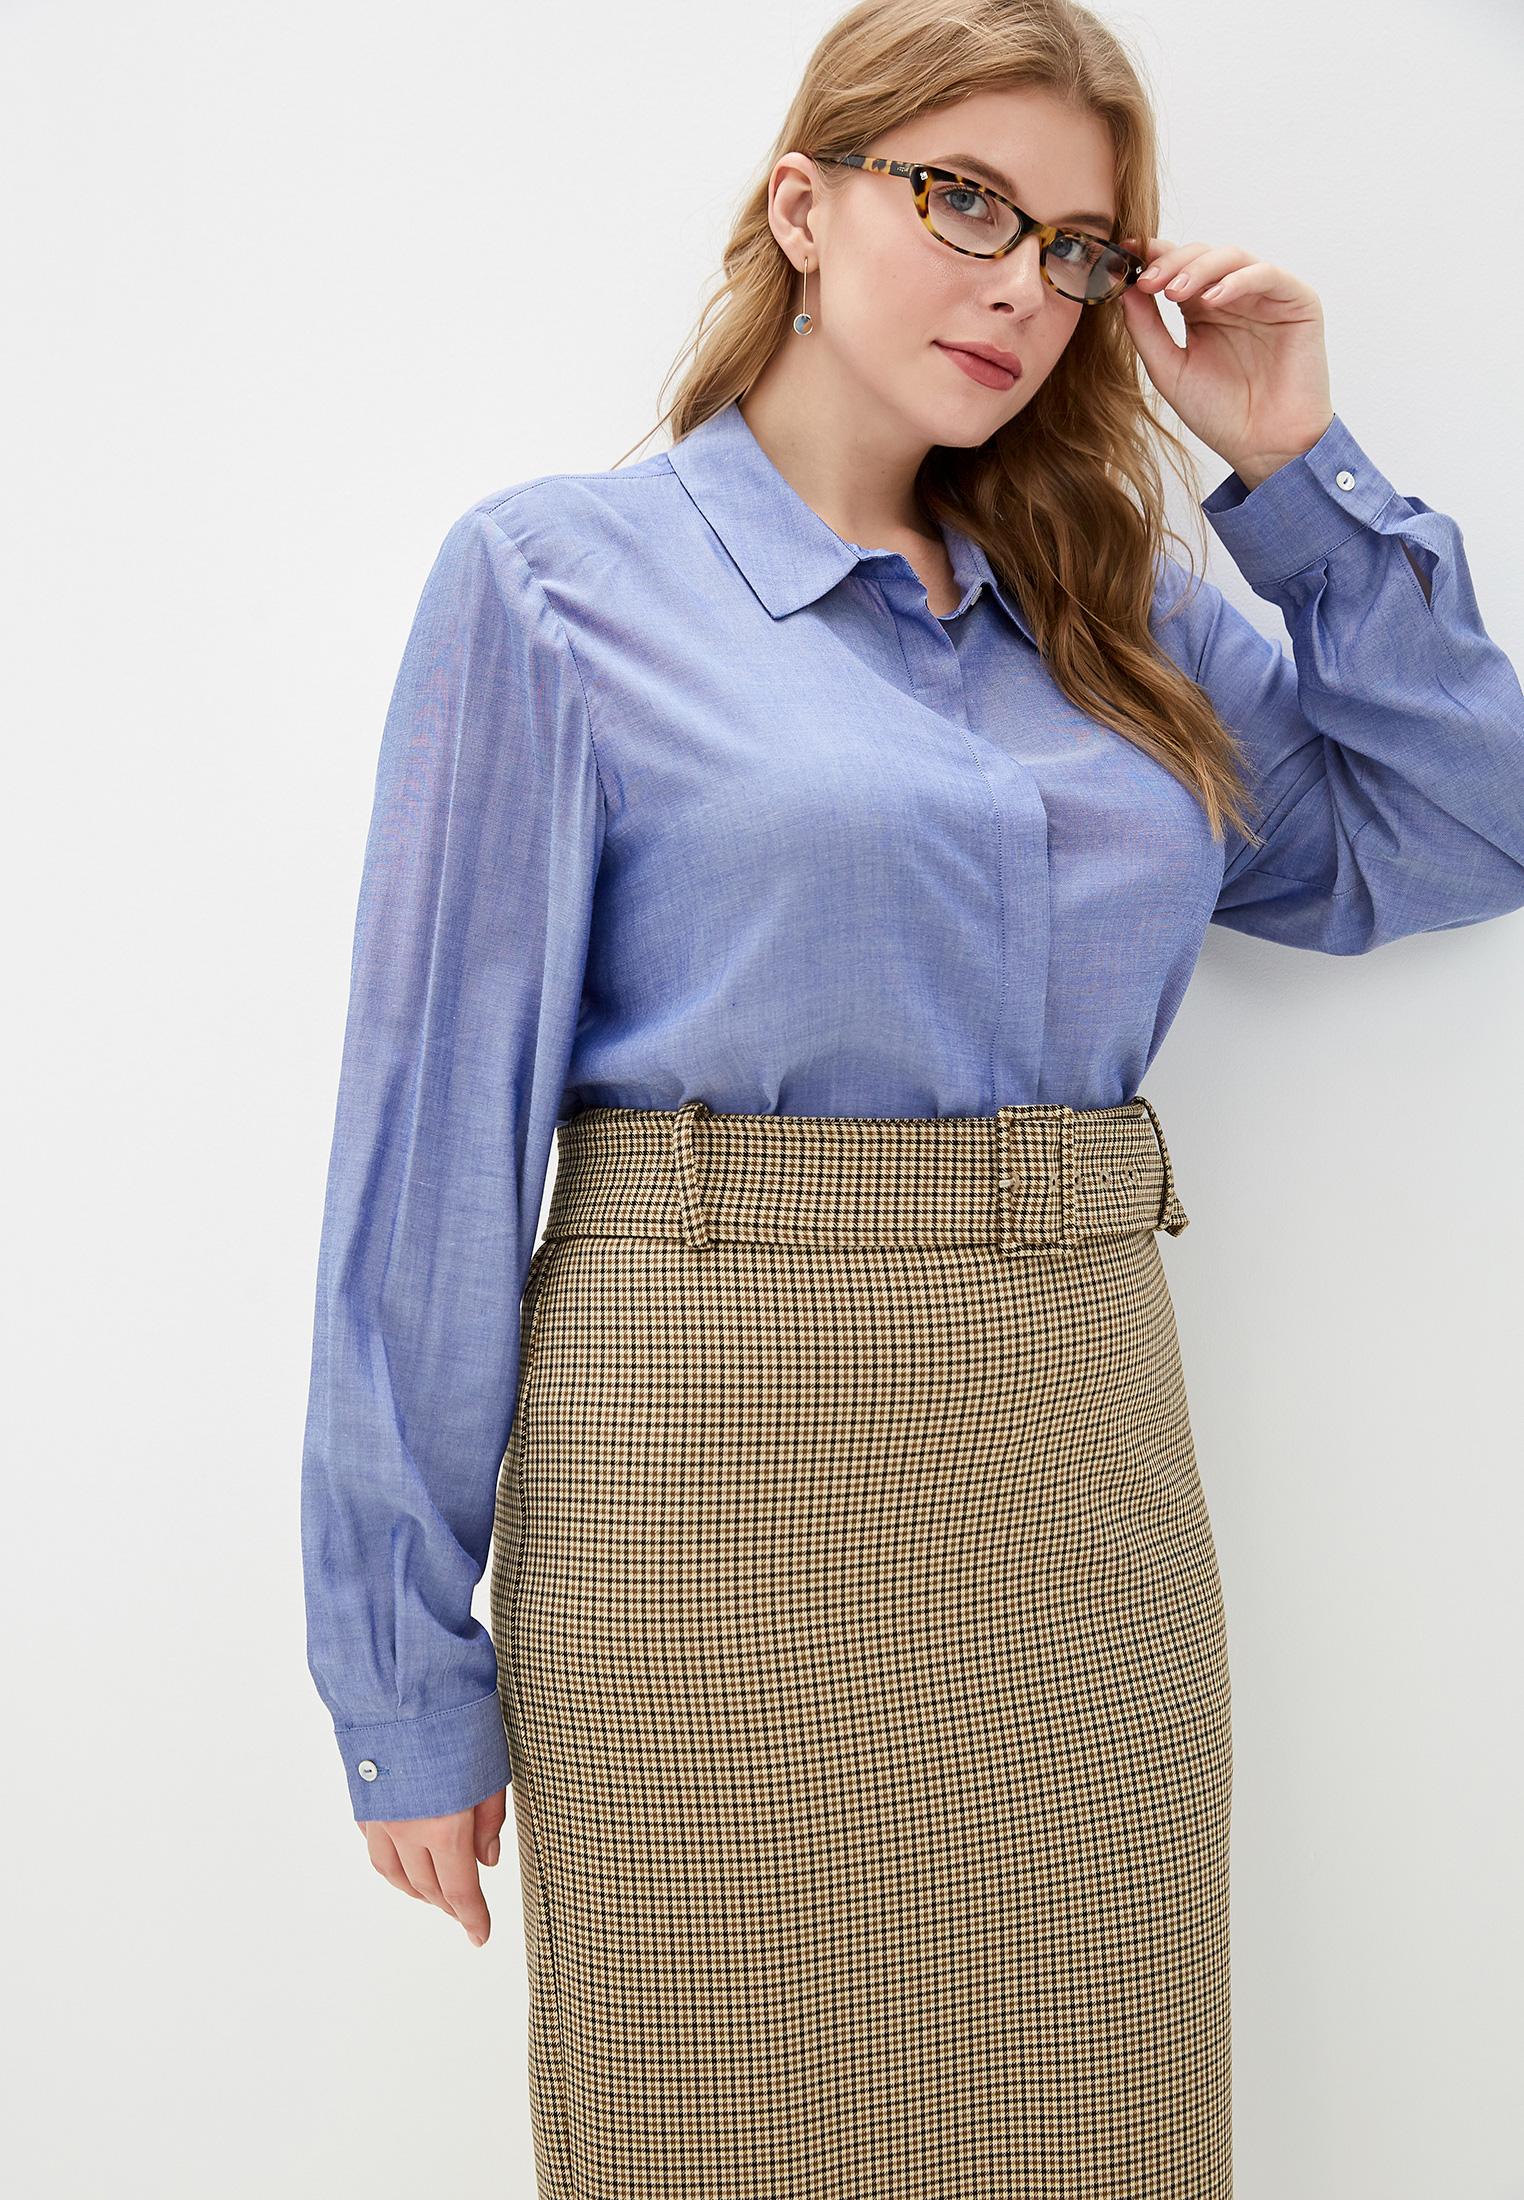 Женские рубашки с длинным рукавом Persona by Marina Rinaldi 1113269